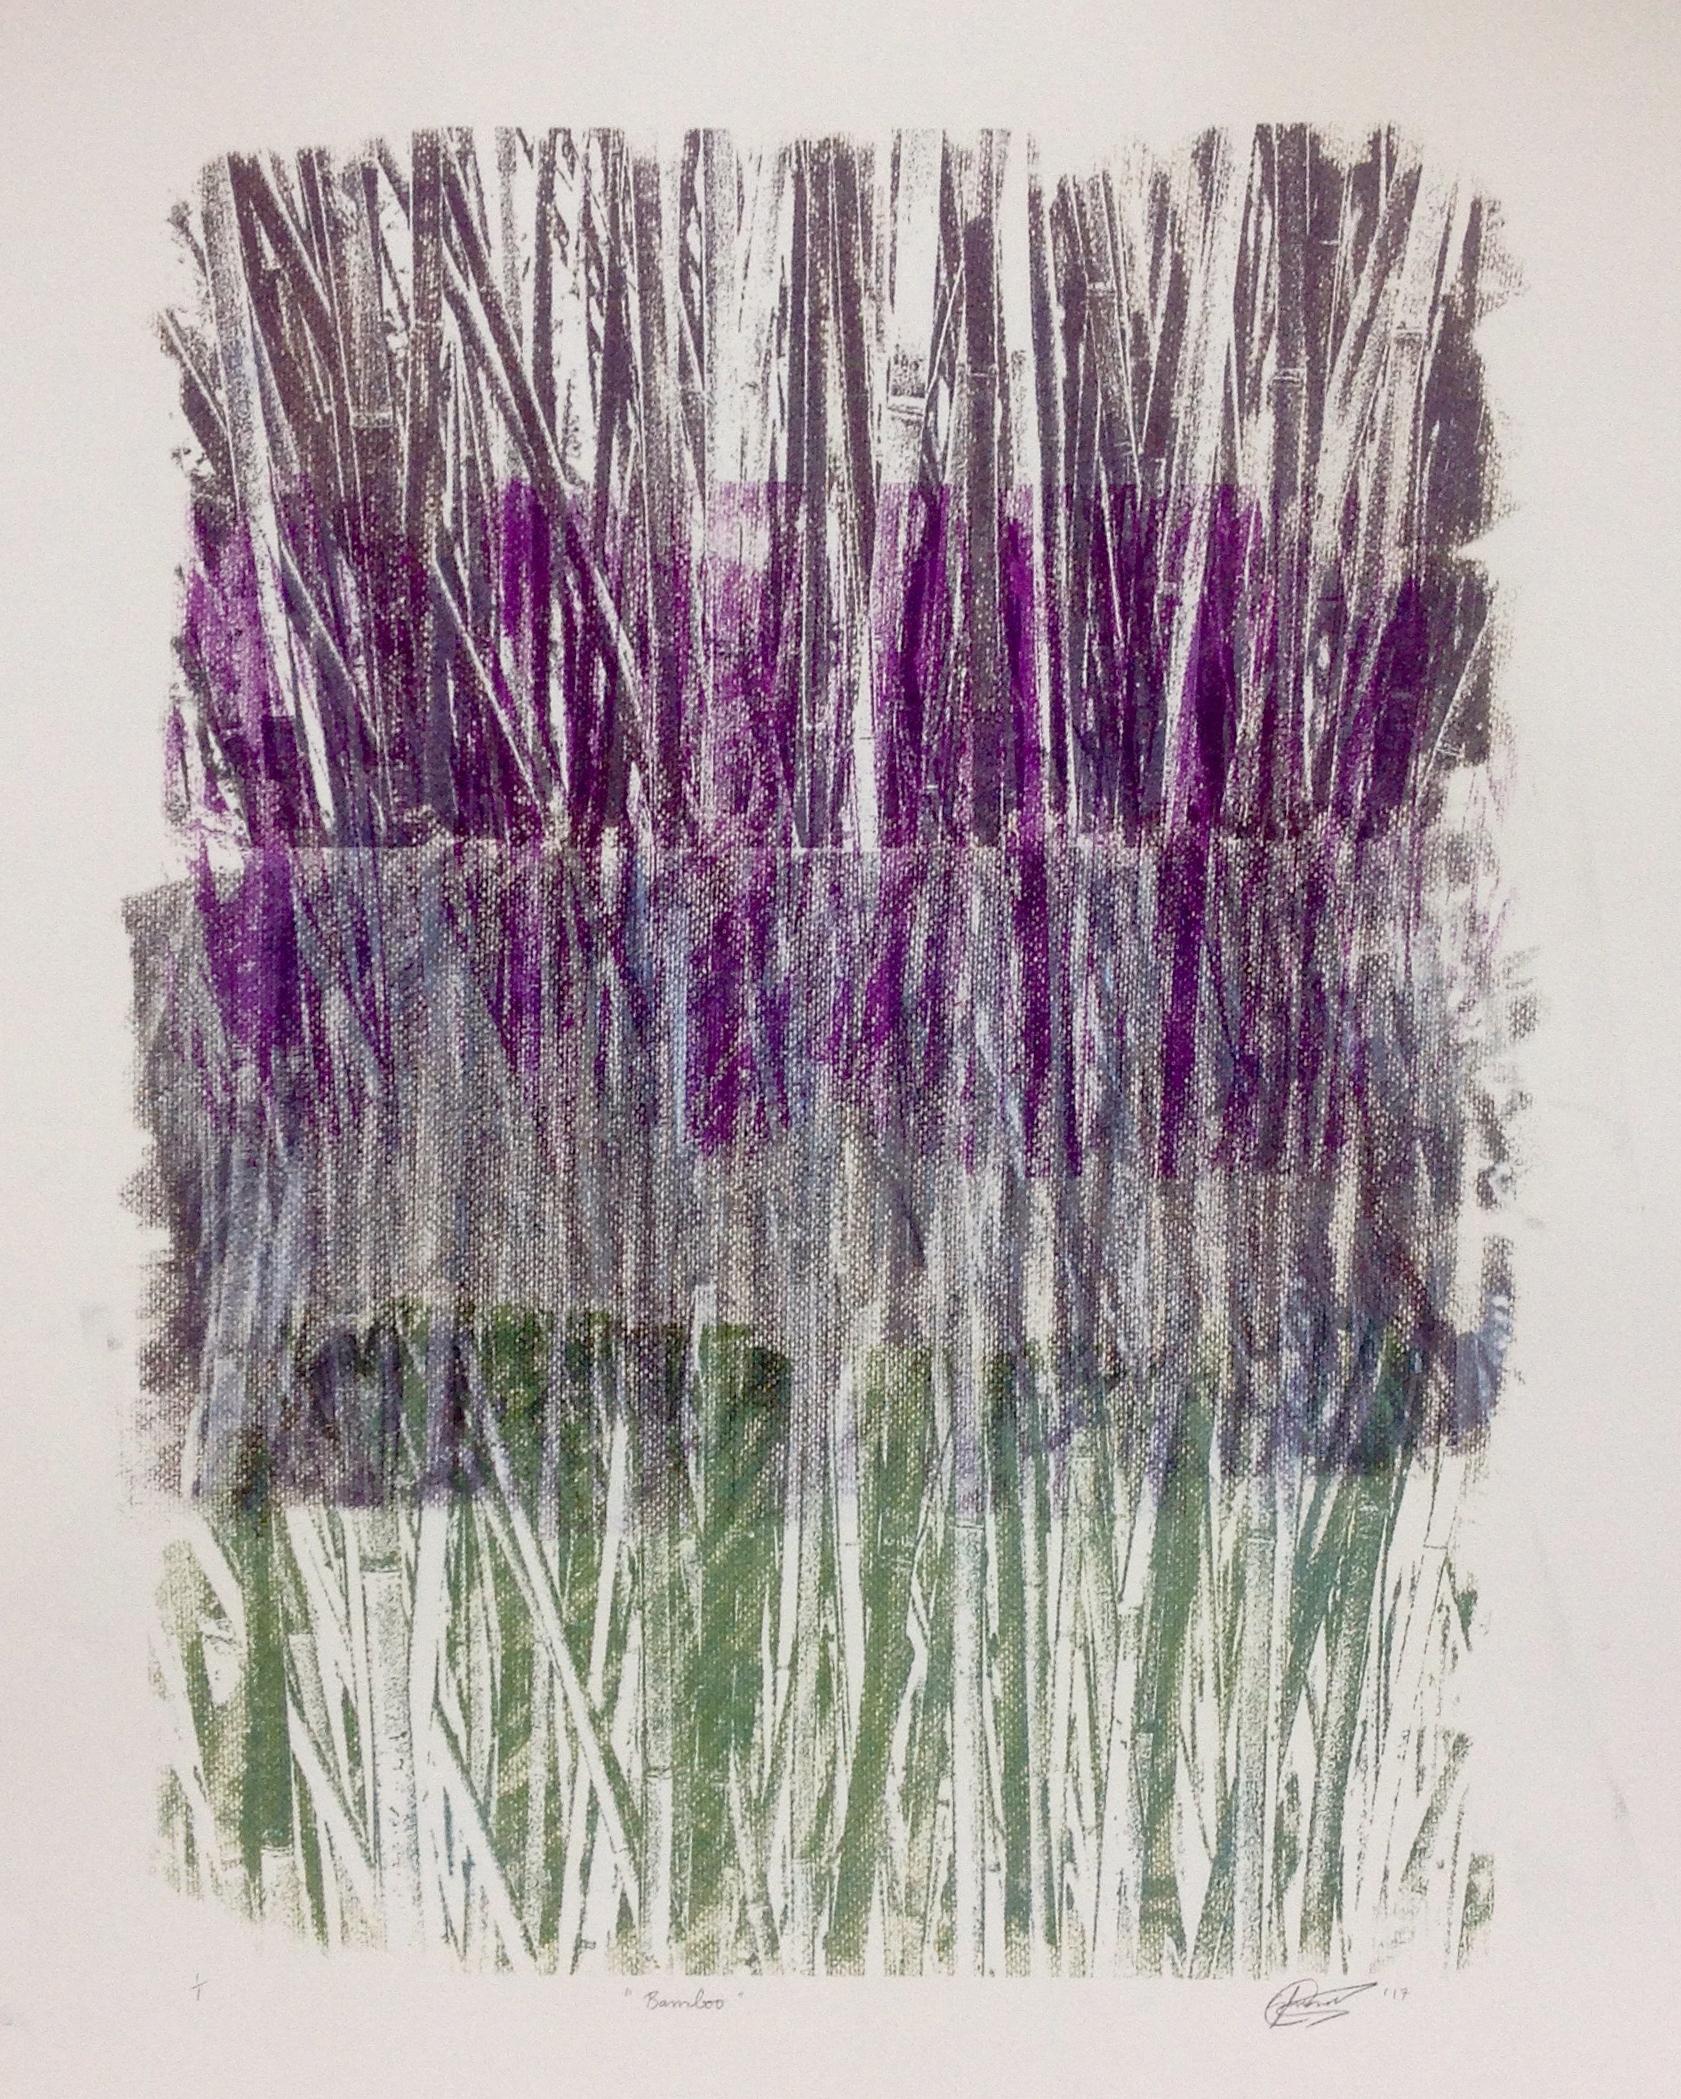 Bamboo. Monoprint. 40x60 cm. 2017. SOLD.